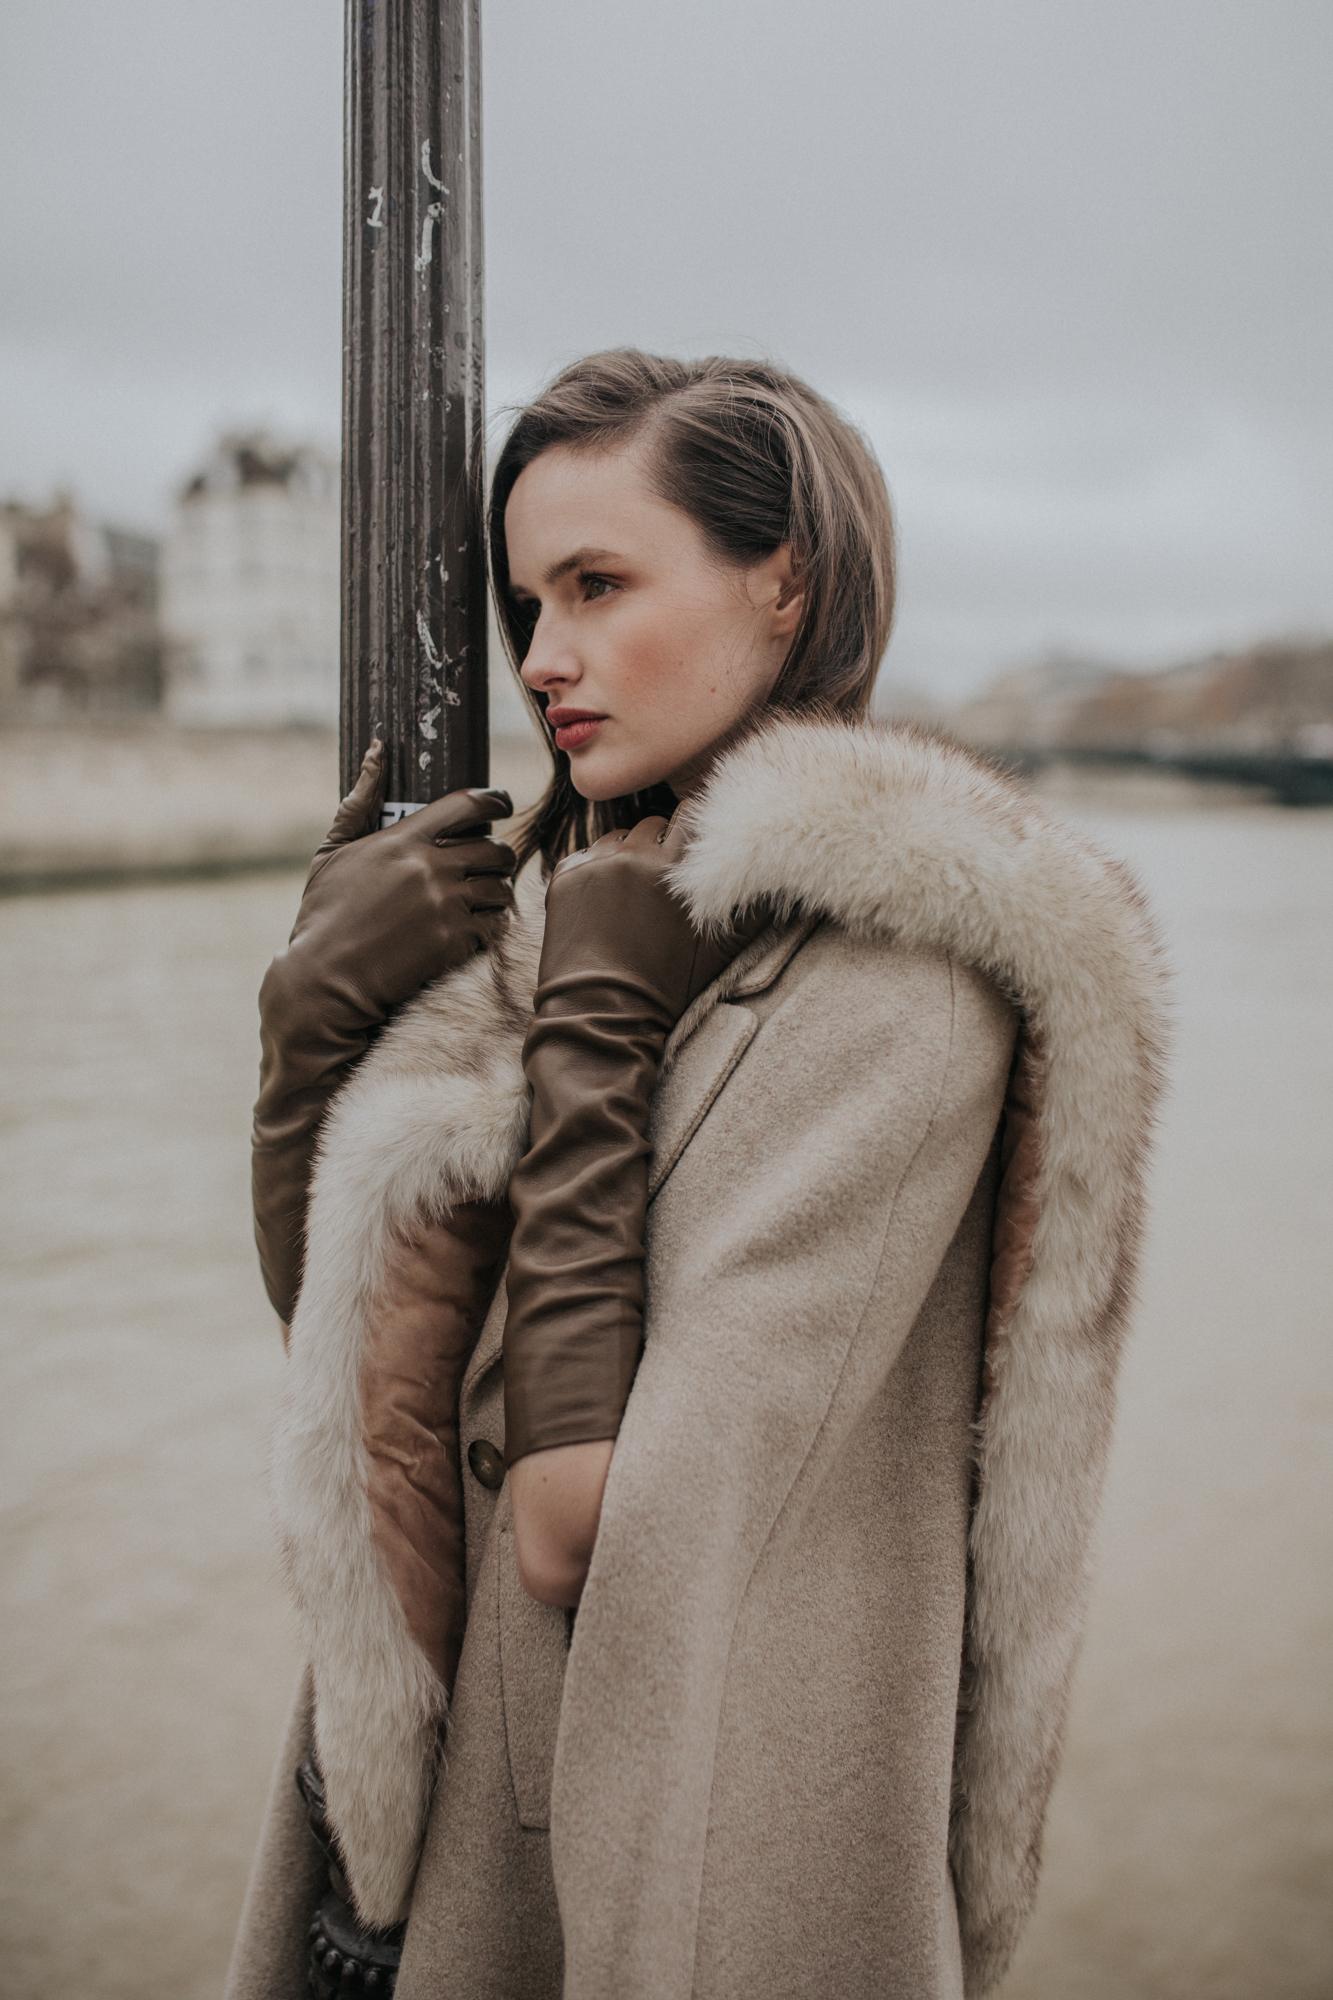 Maria Traynor - Paris Fashion Photography Test Shoot